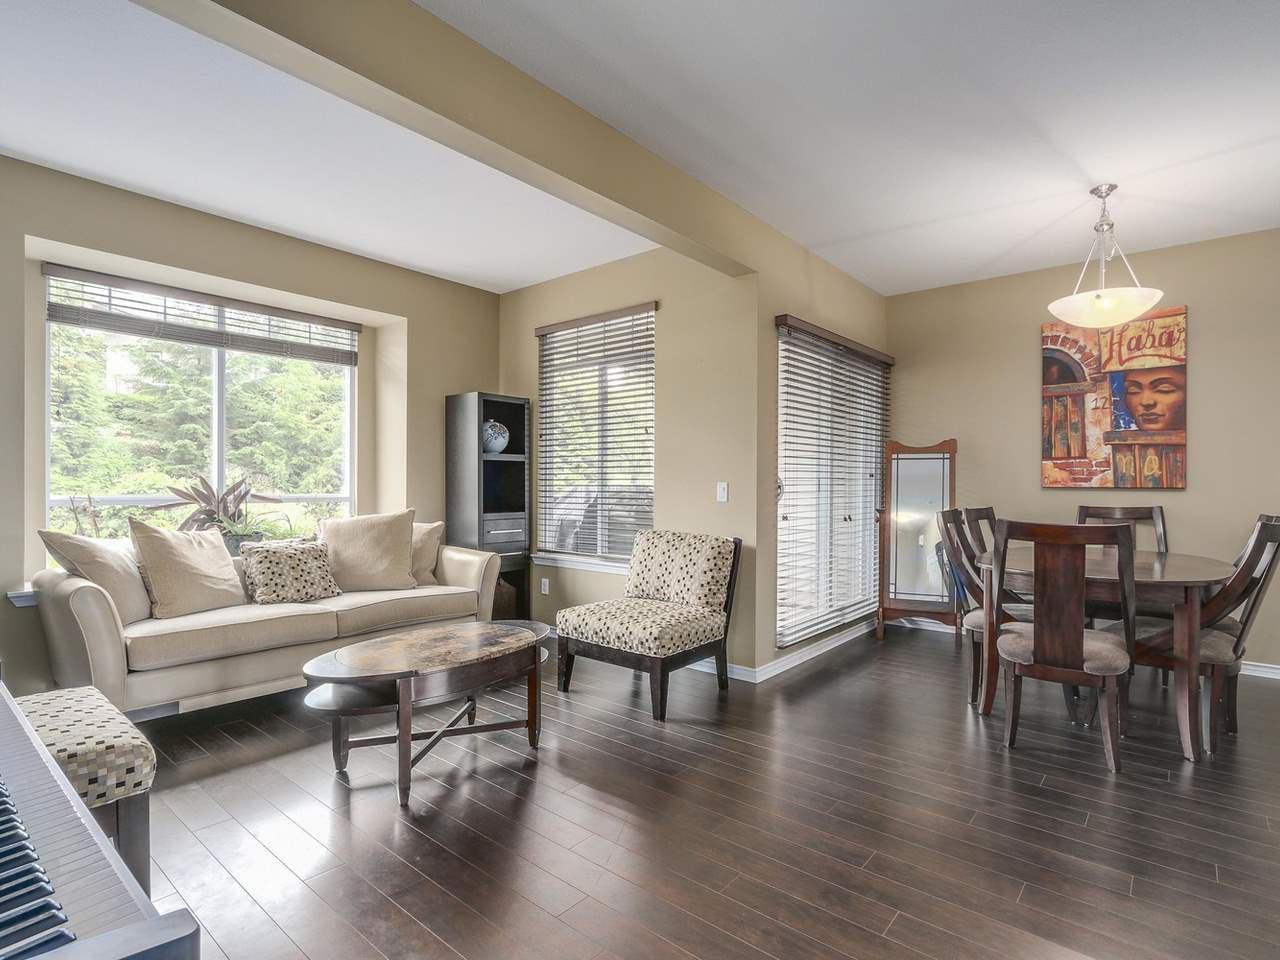 "Photo 3: Photos: 2 23233 KANAKA Way in Maple Ridge: Cottonwood MR Townhouse for sale in ""RIVERWOOD"" : MLS®# R2112549"